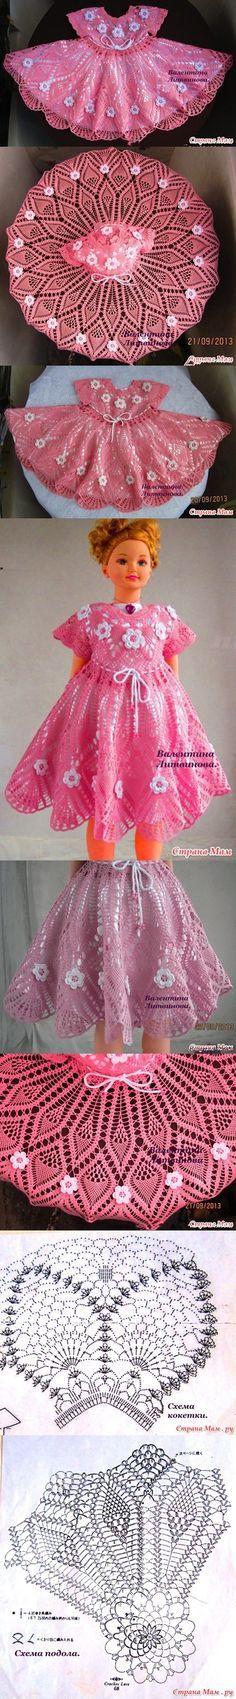 DIY Crochet Princess Dress